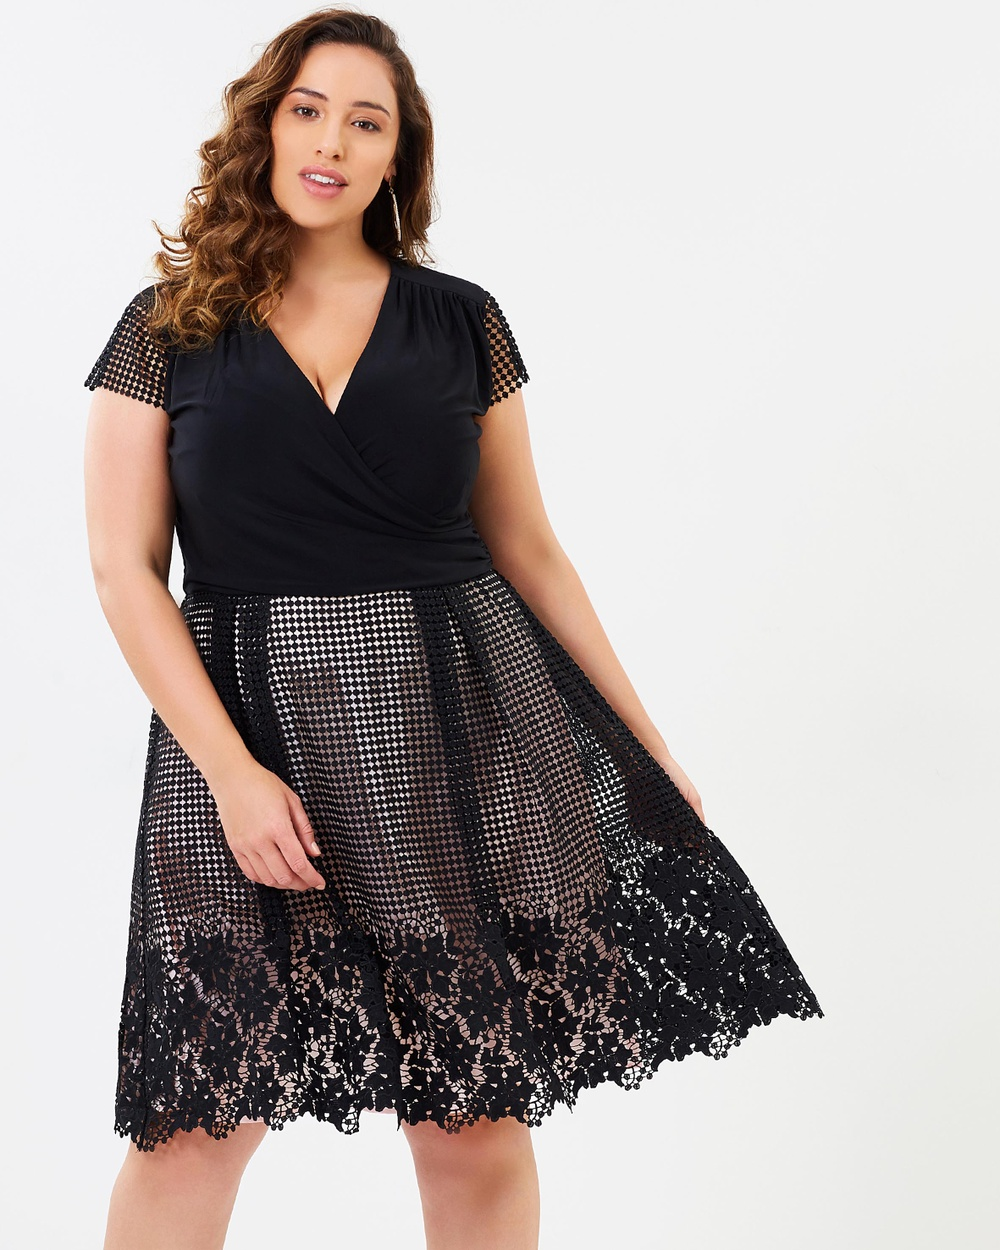 Studio 8 Romola Dress Dresses Black & Ivory Romola Dress